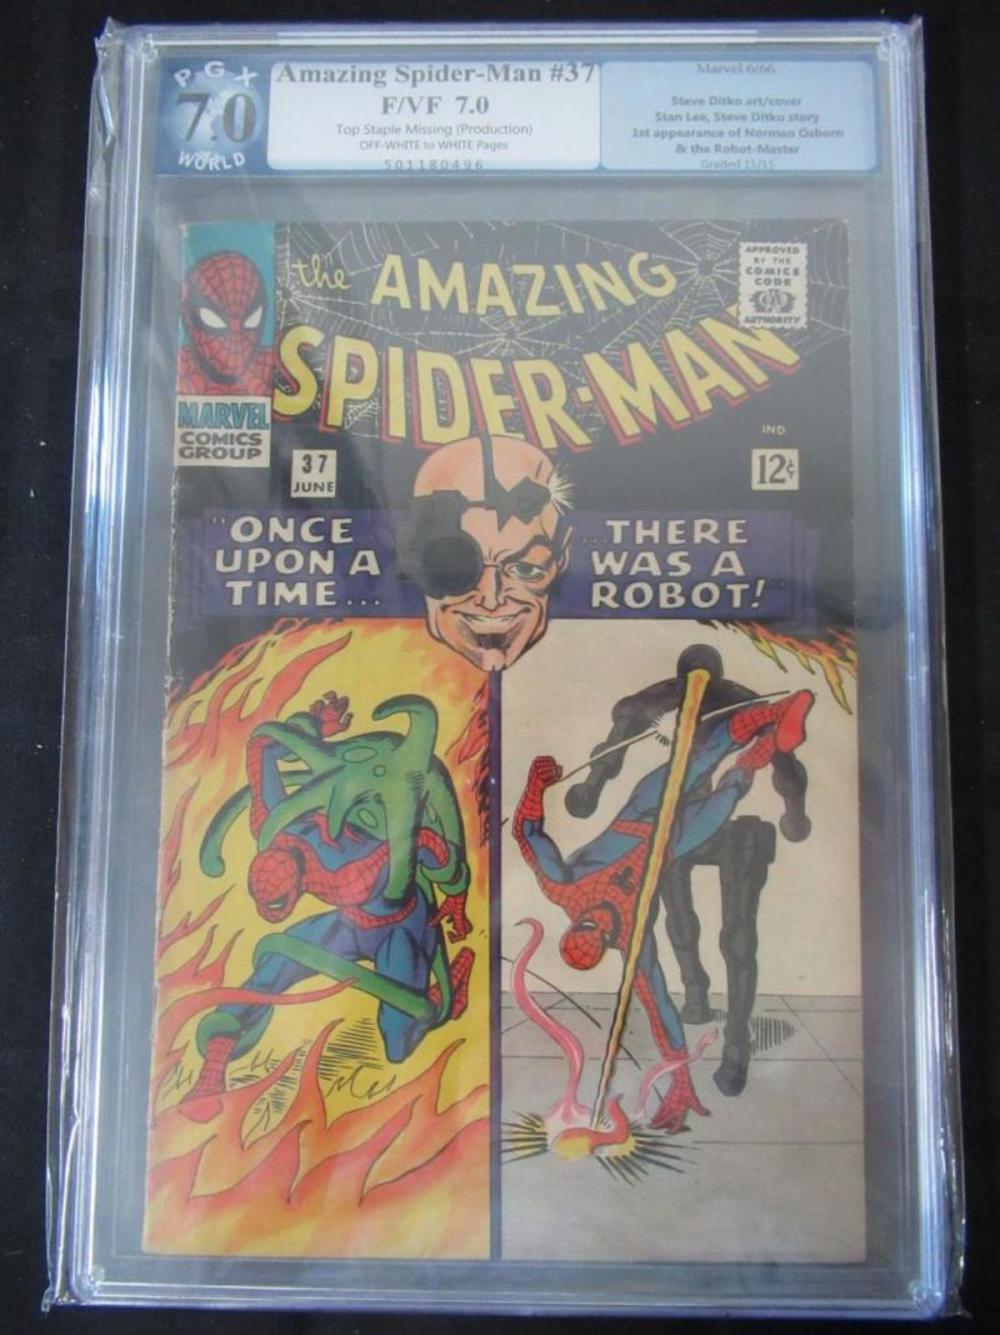 Amazing Spider-Man #37 PGX 7.0 Ditko Cover/Art